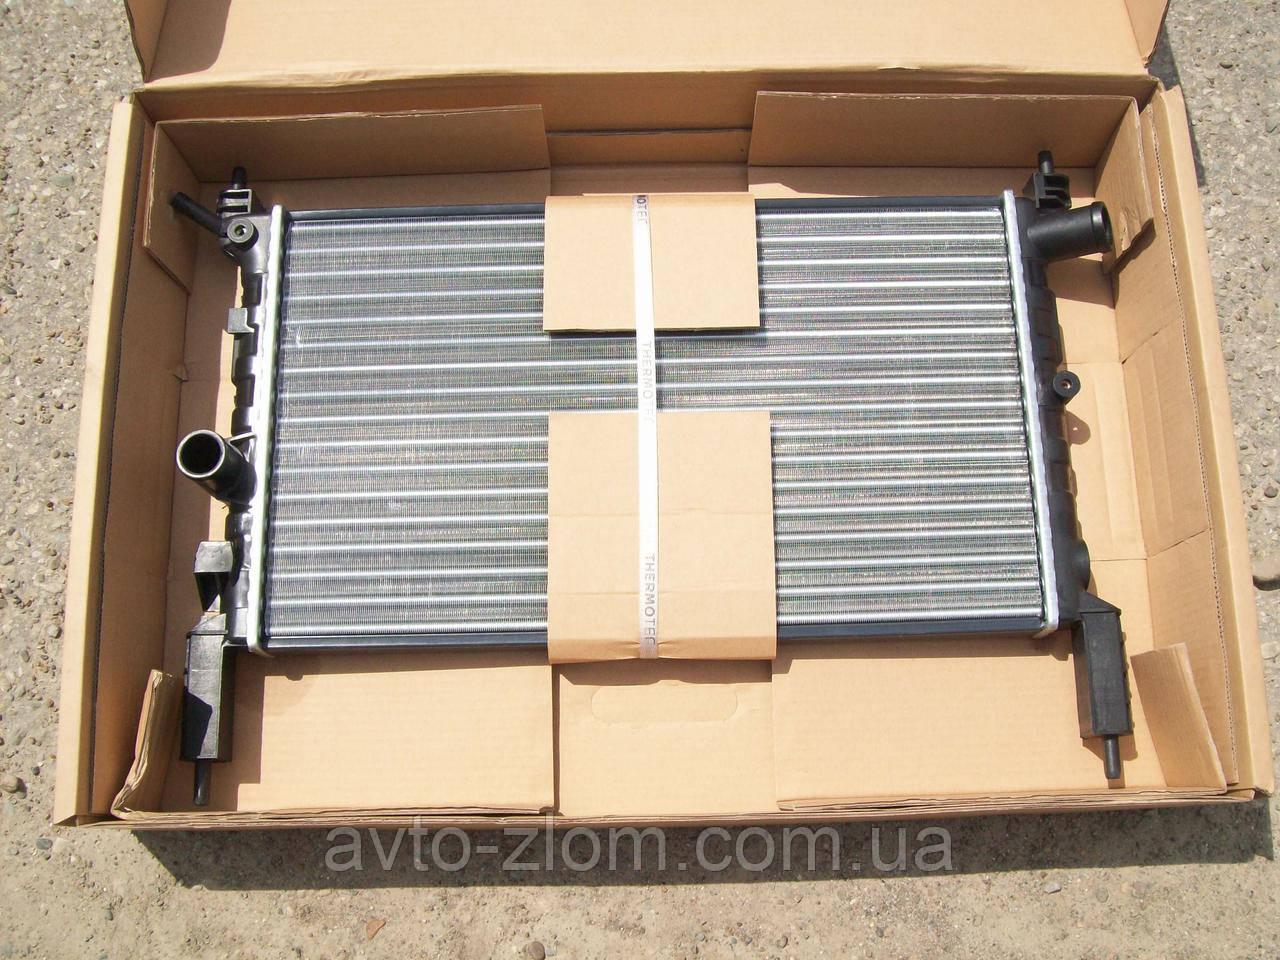 Радиатор Opel Astra F, Опель Астра Ф 1,4 - 1,6 8V.